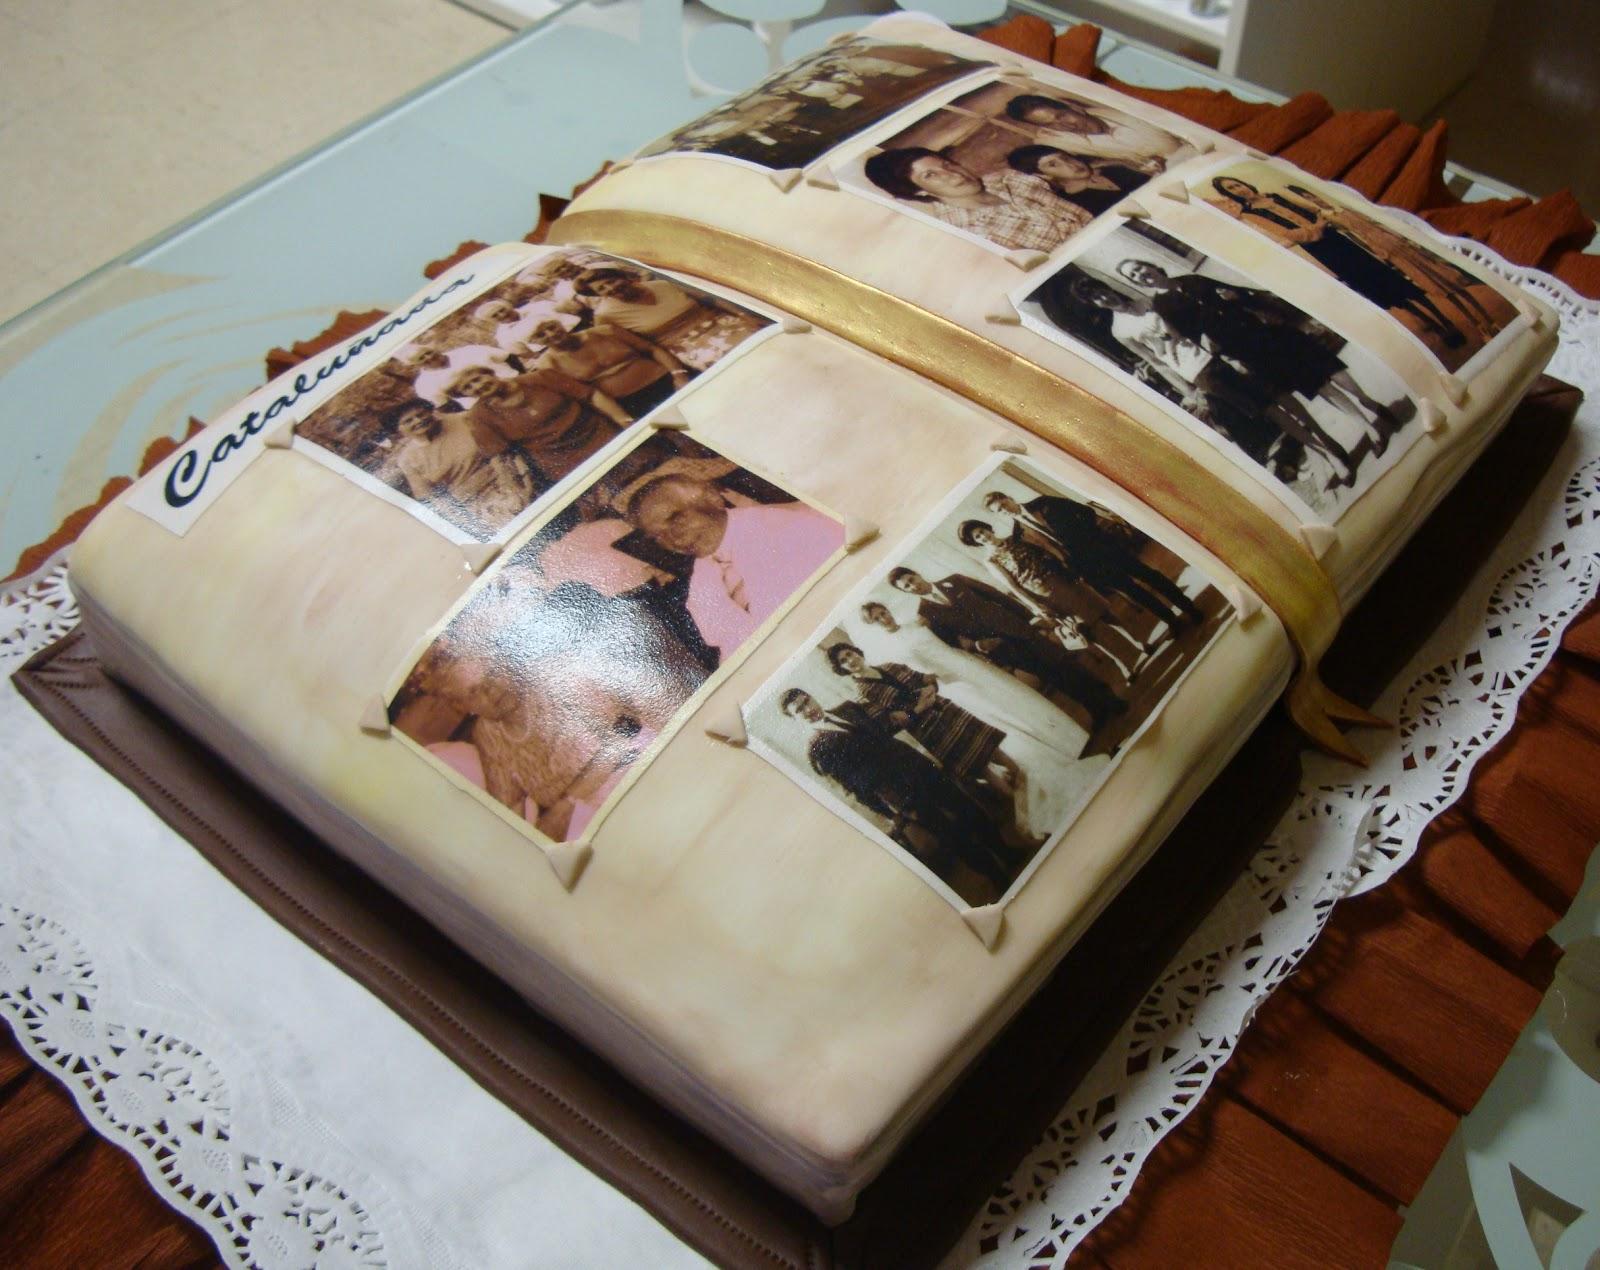 Dulcear t tarta lbum fotos - Decoracion de album de fotos ...